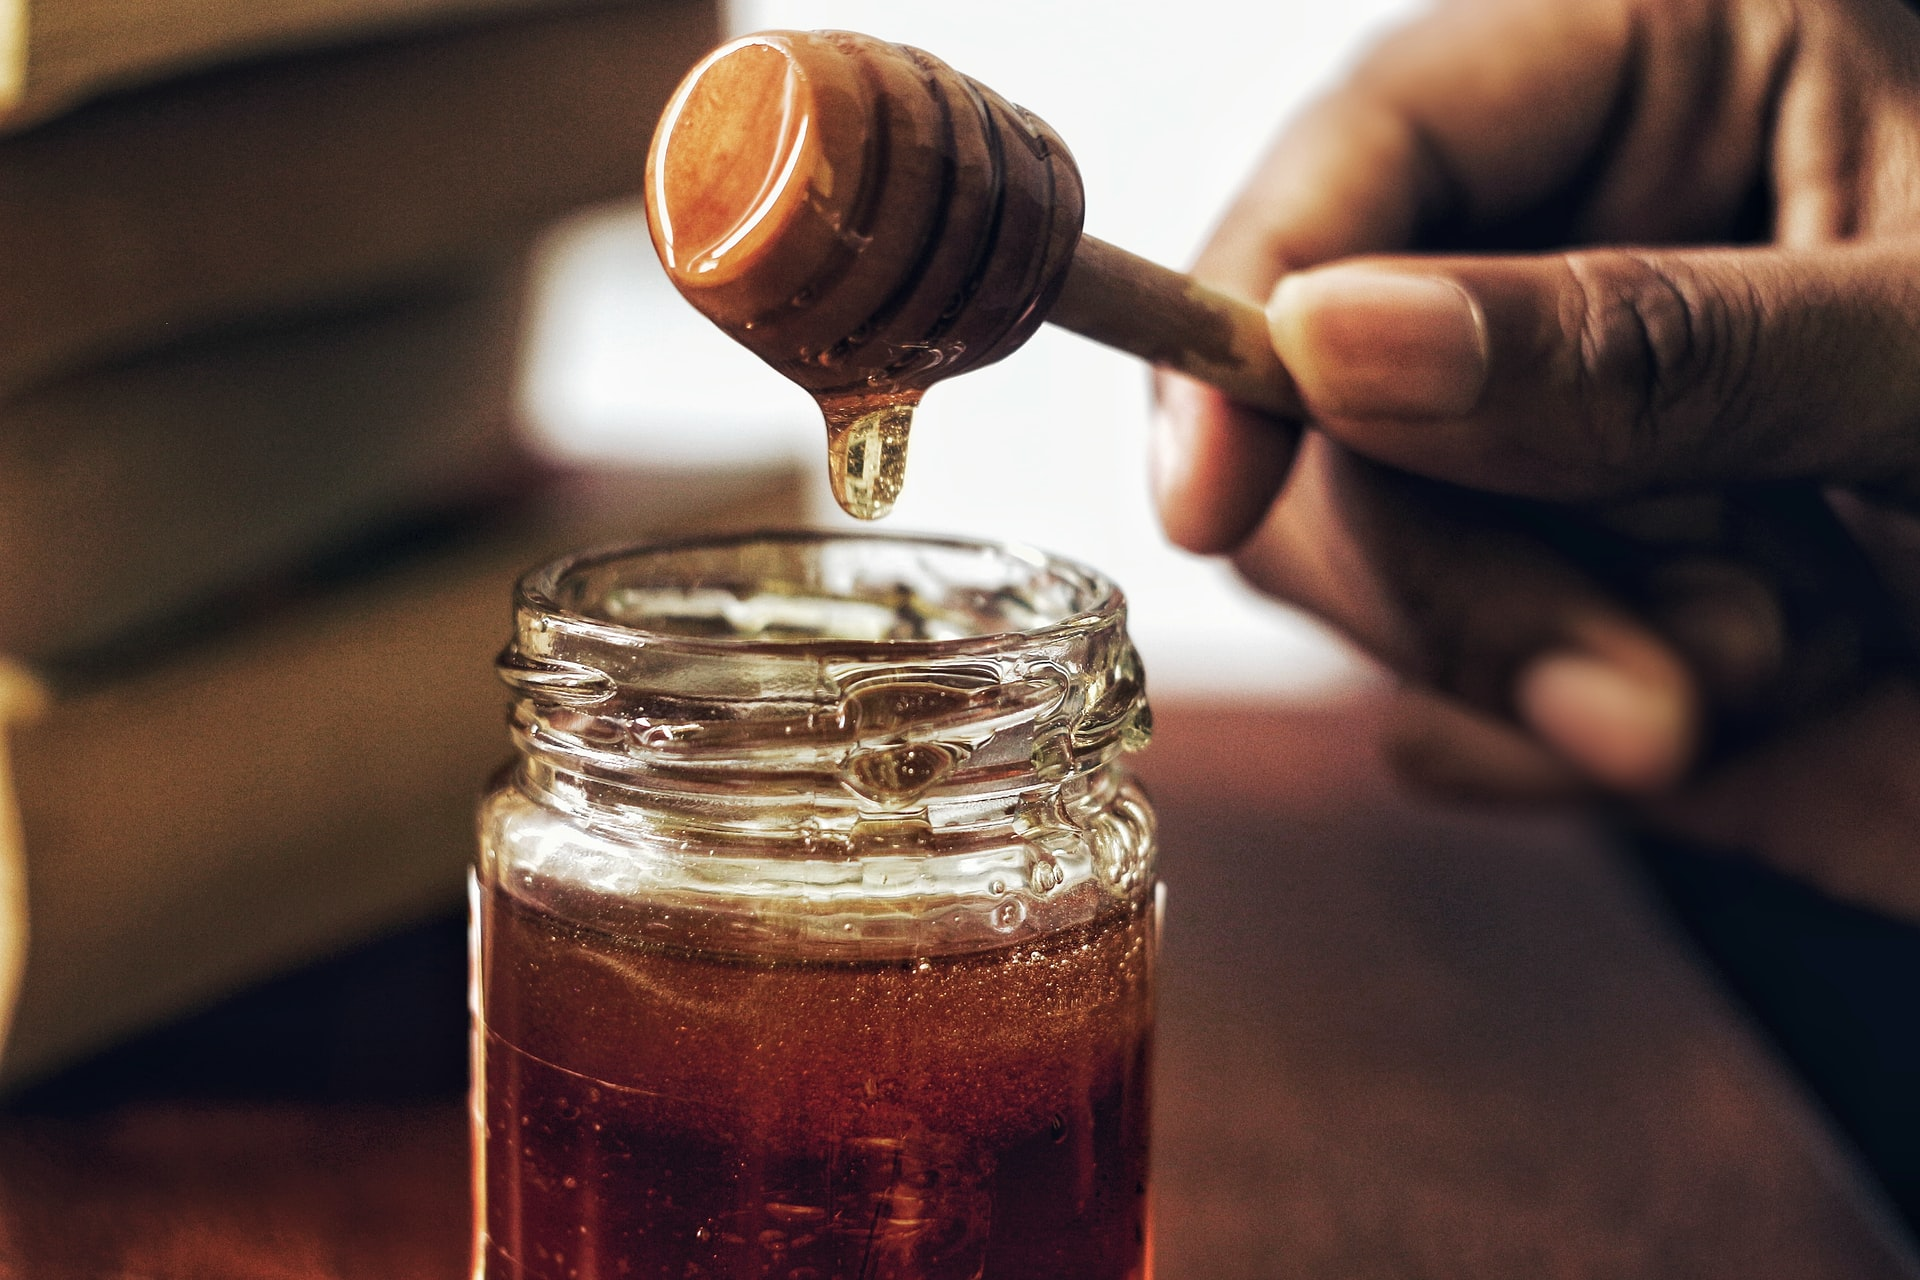 How Do I Know If My Umf Manuka Honey Is Real?